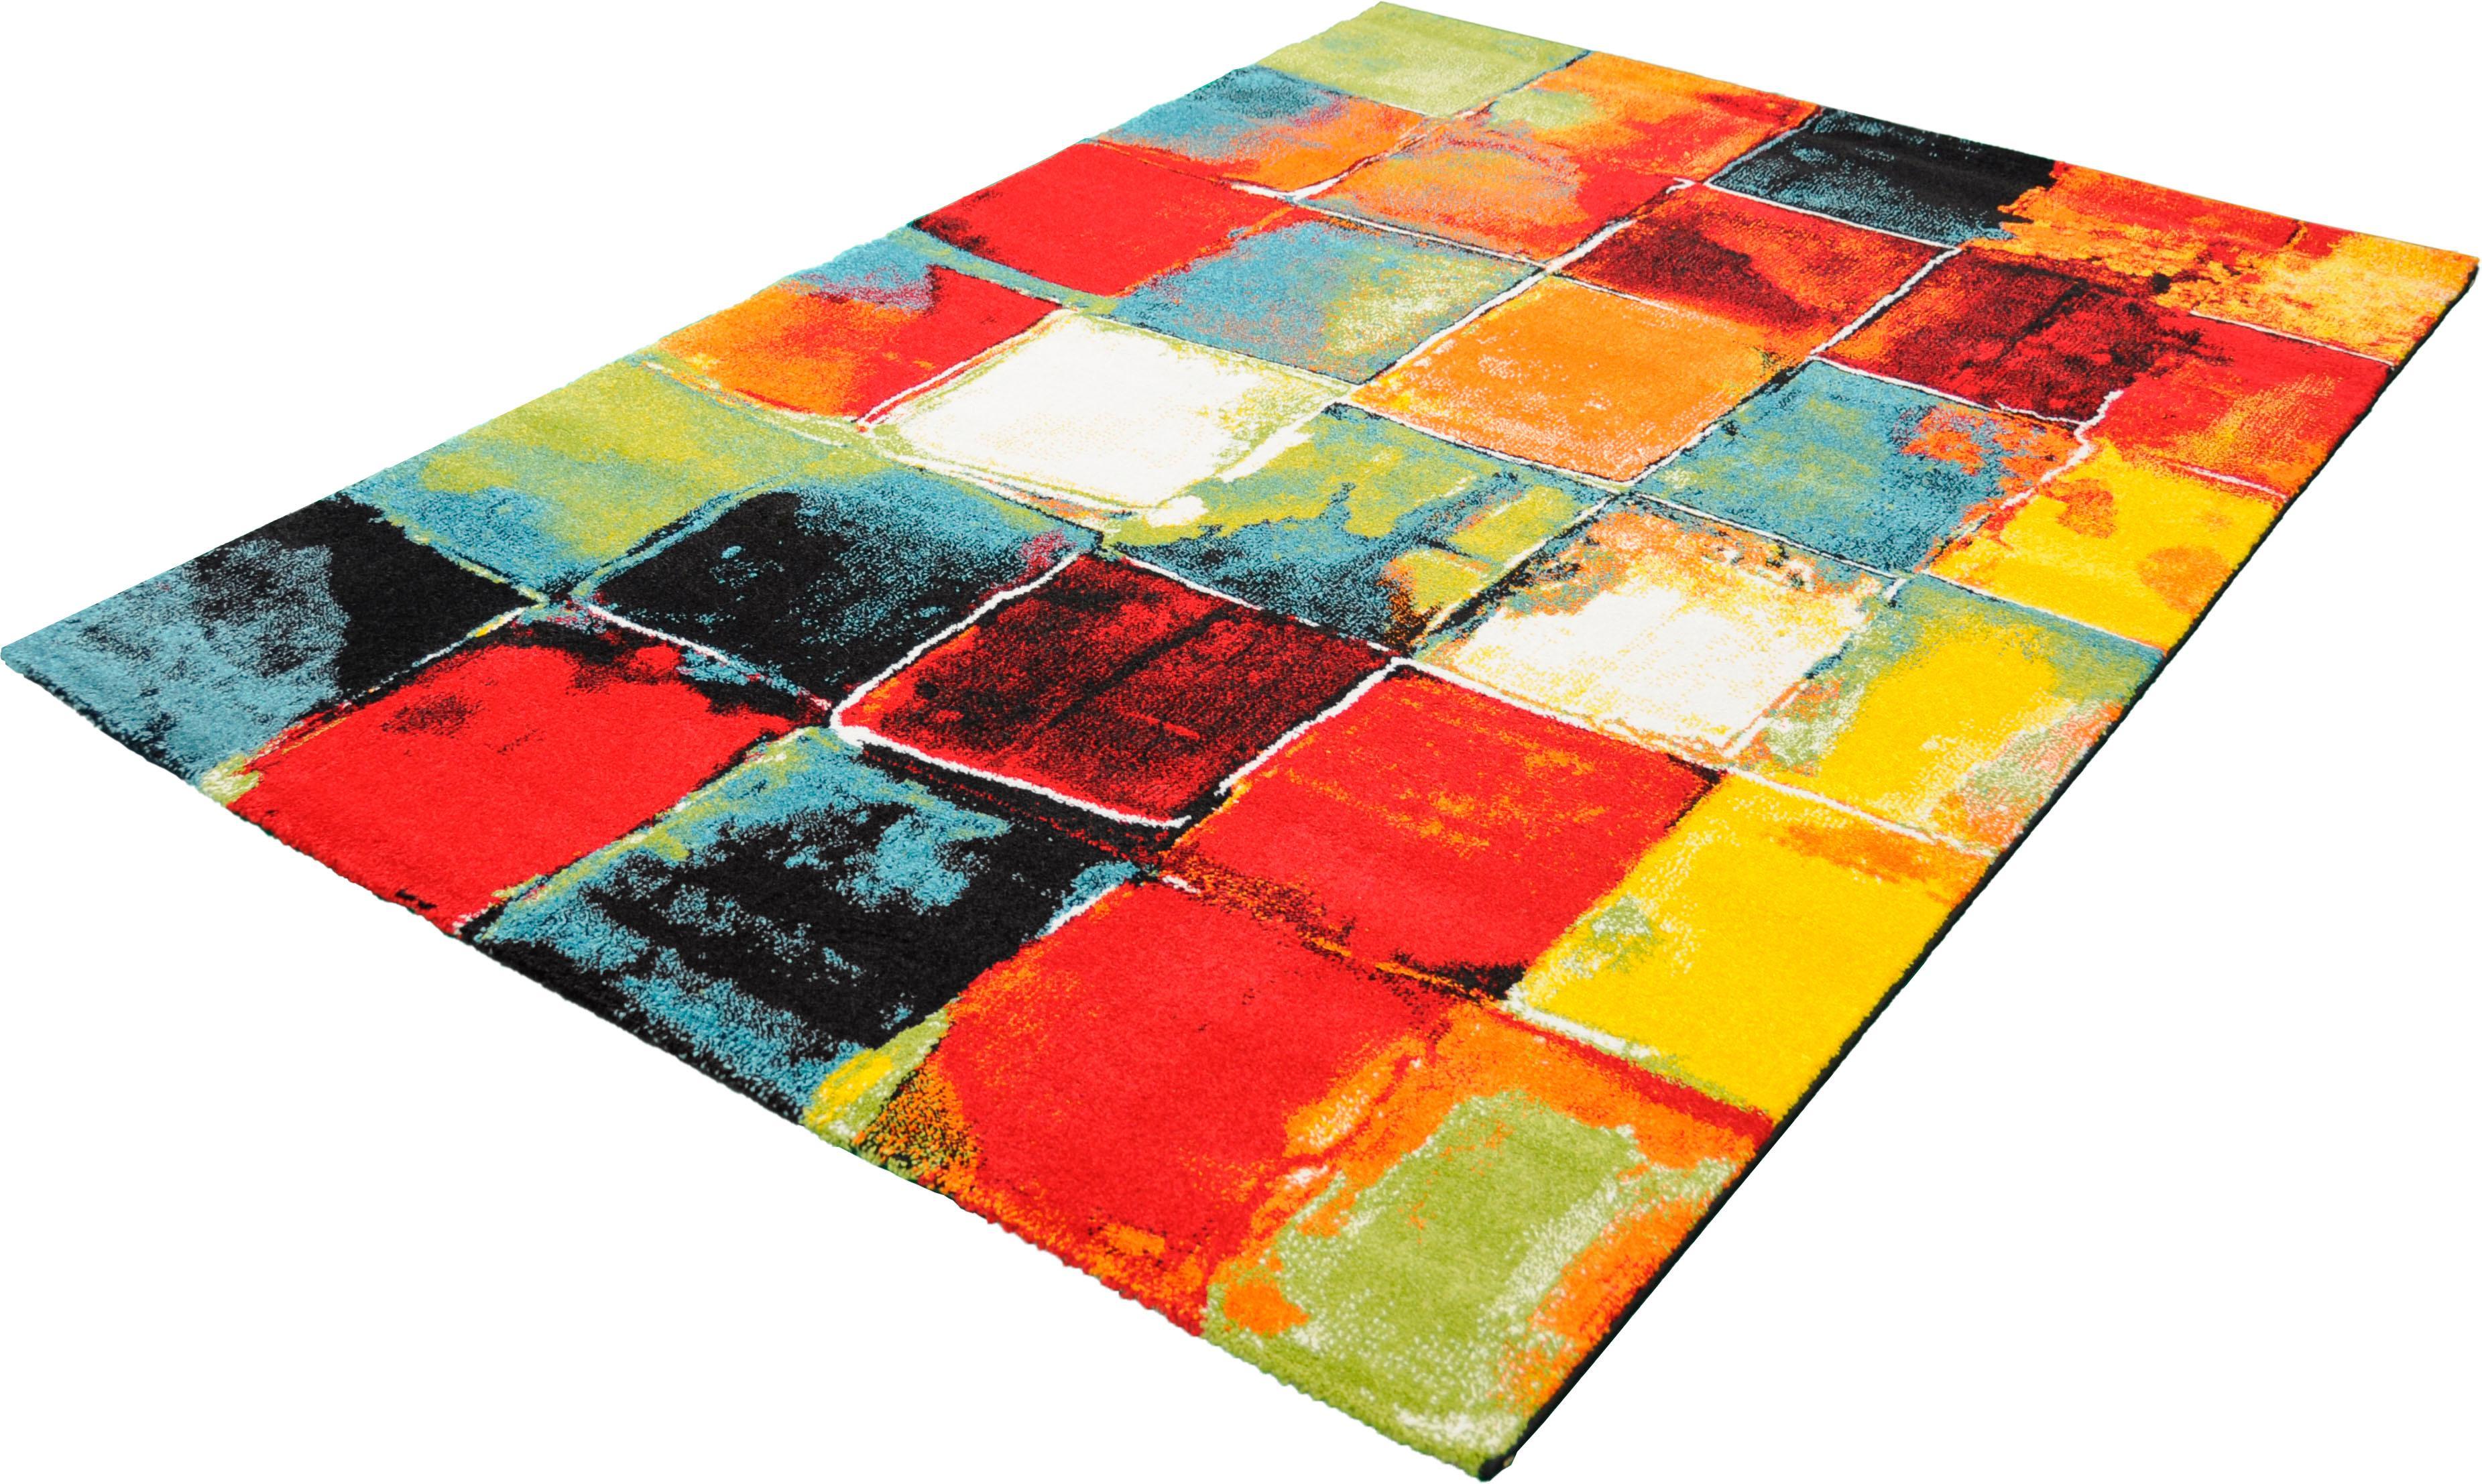 Teppich BELIS PATCHWORK merinos rechteckig Höhe 13 mm maschinell gewebt